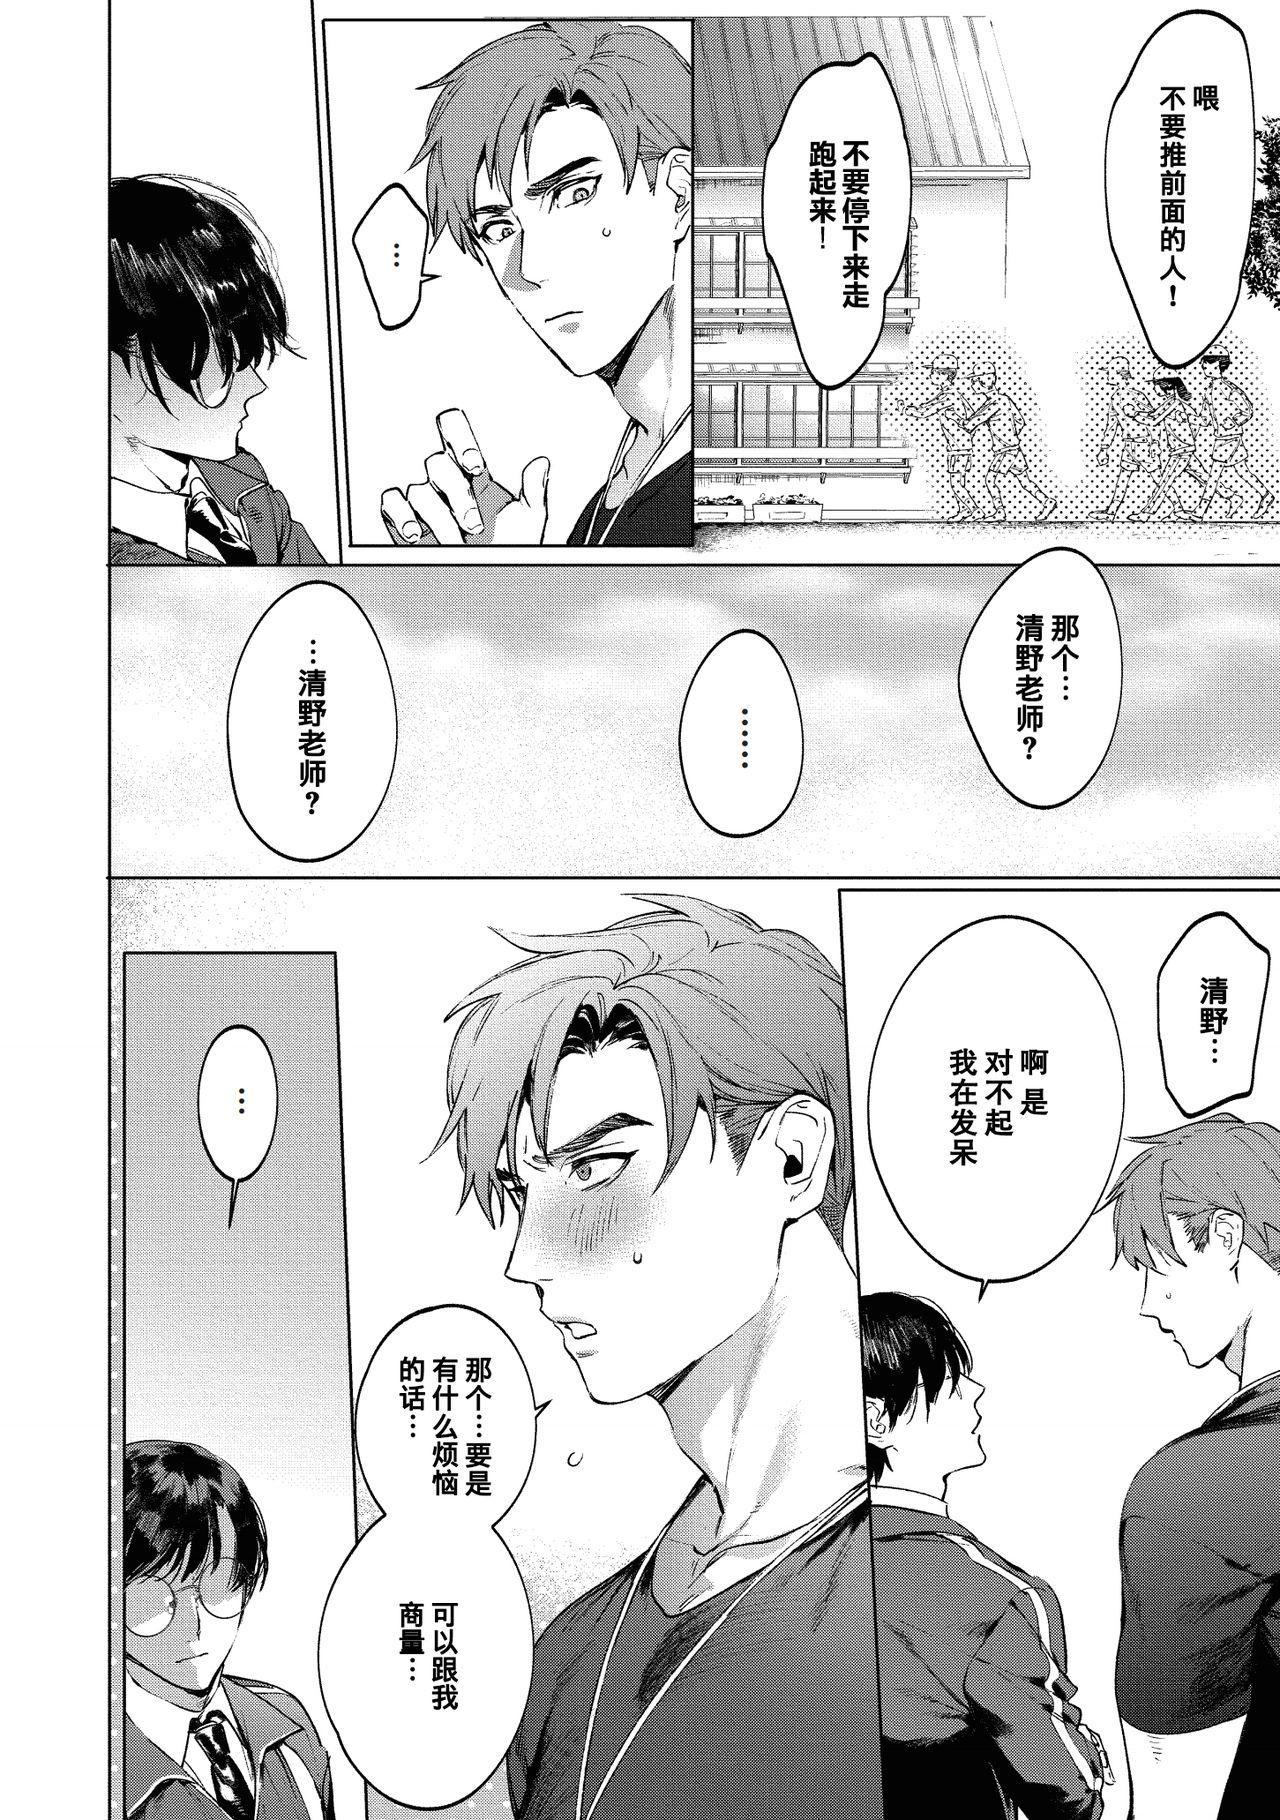 Sensei wa Benki ja Arimasen.3 | 老师不是便器。3 9